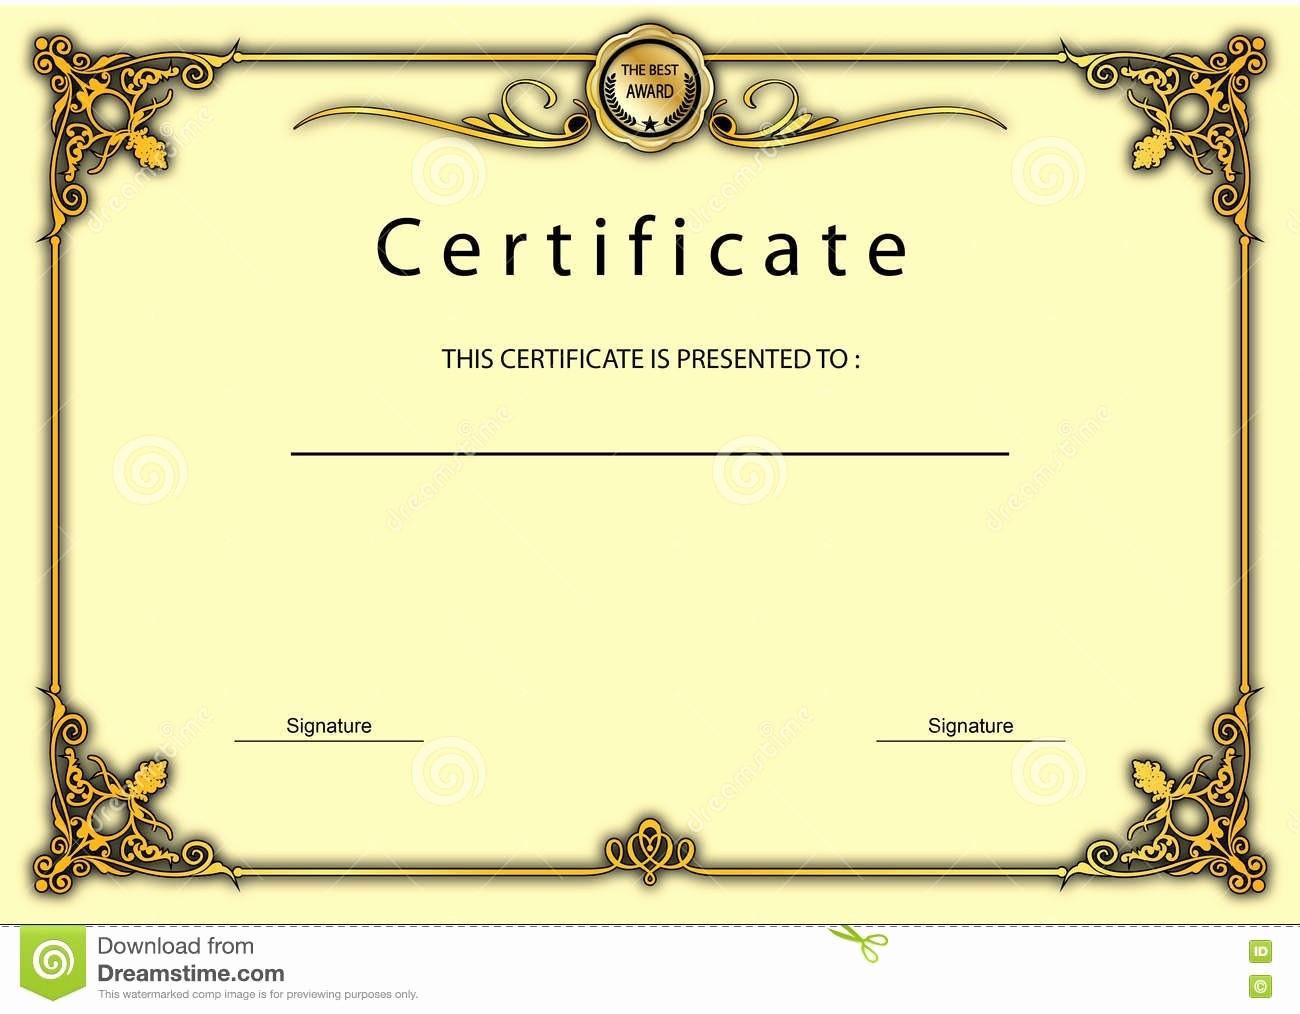 Border for Certificate Of Appreciation Luxury Certificate Appreciation Border Design